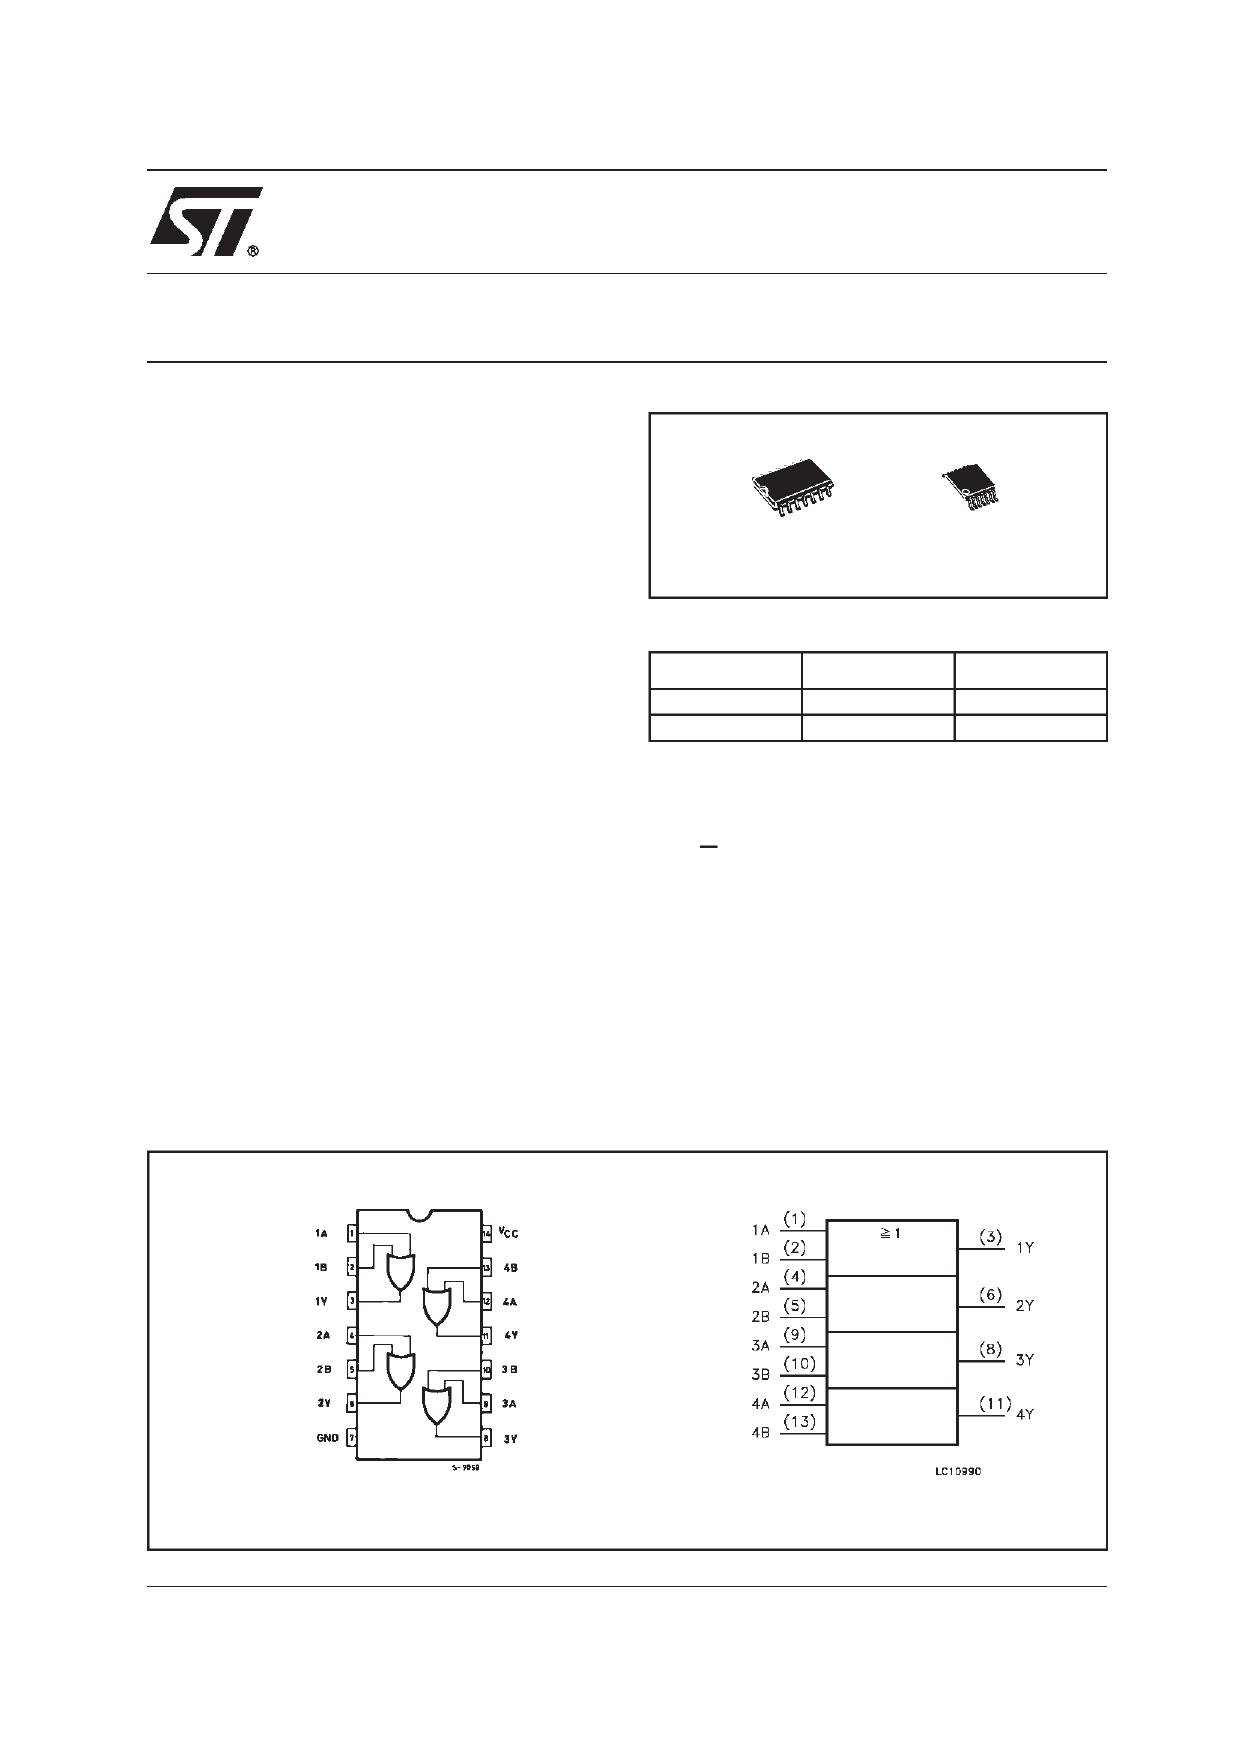 74LVC125A Datasheet